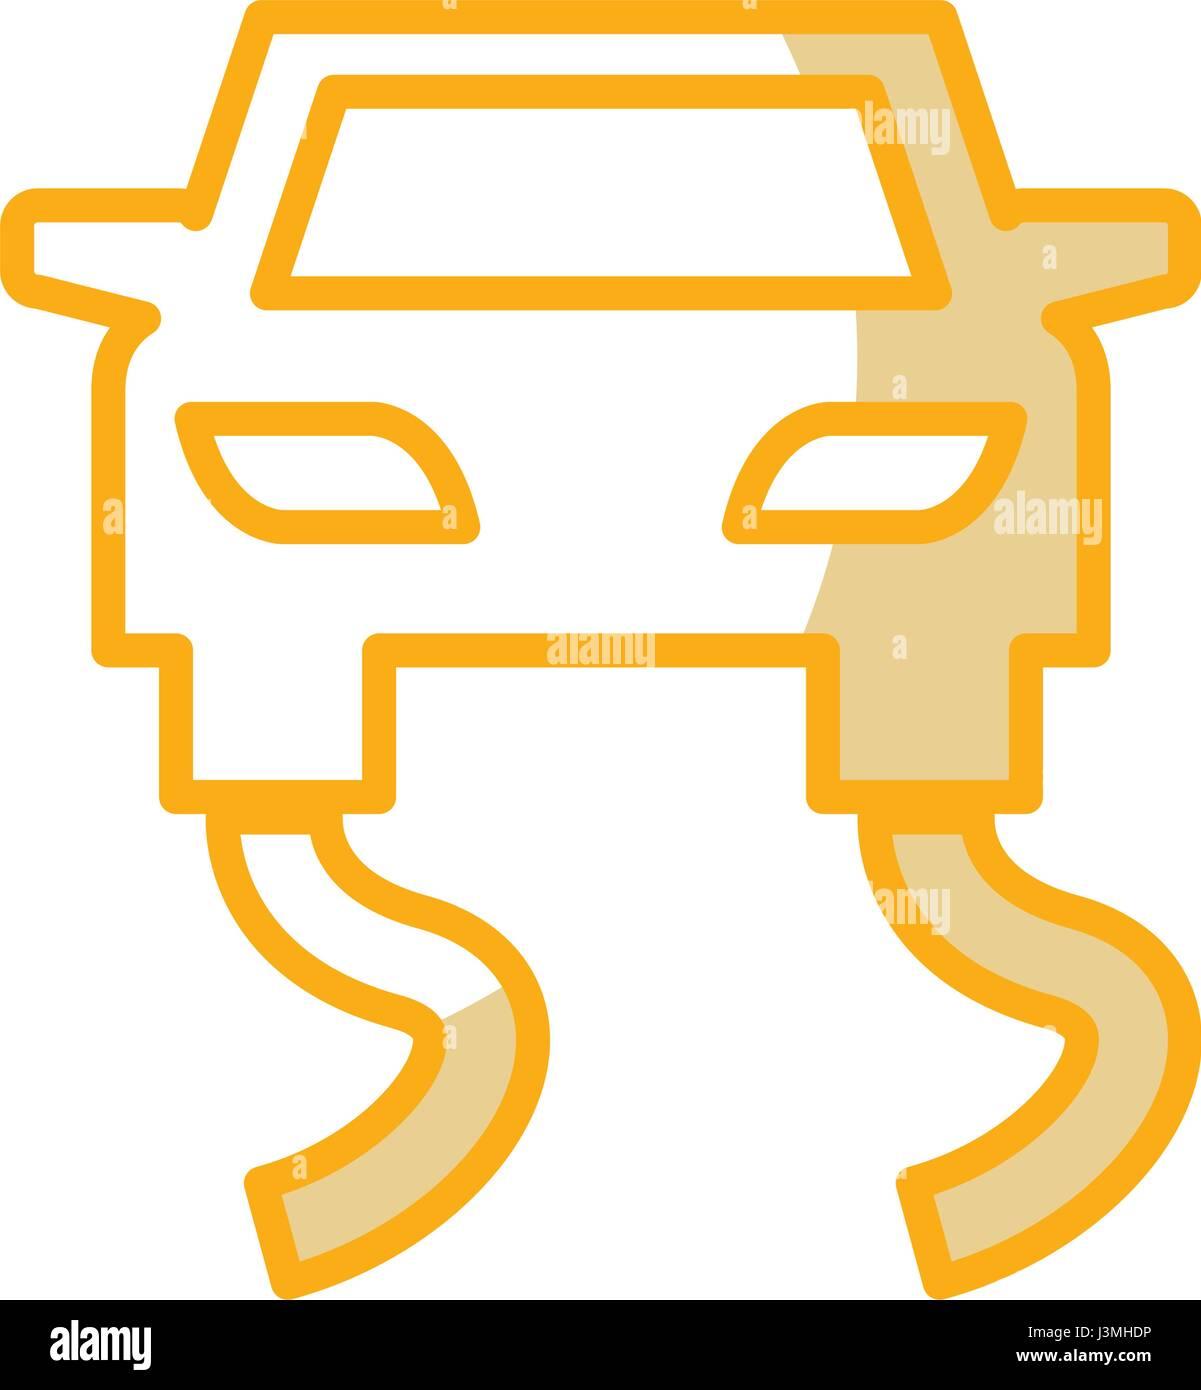 Slippery road traffic signal icon - Stock Image